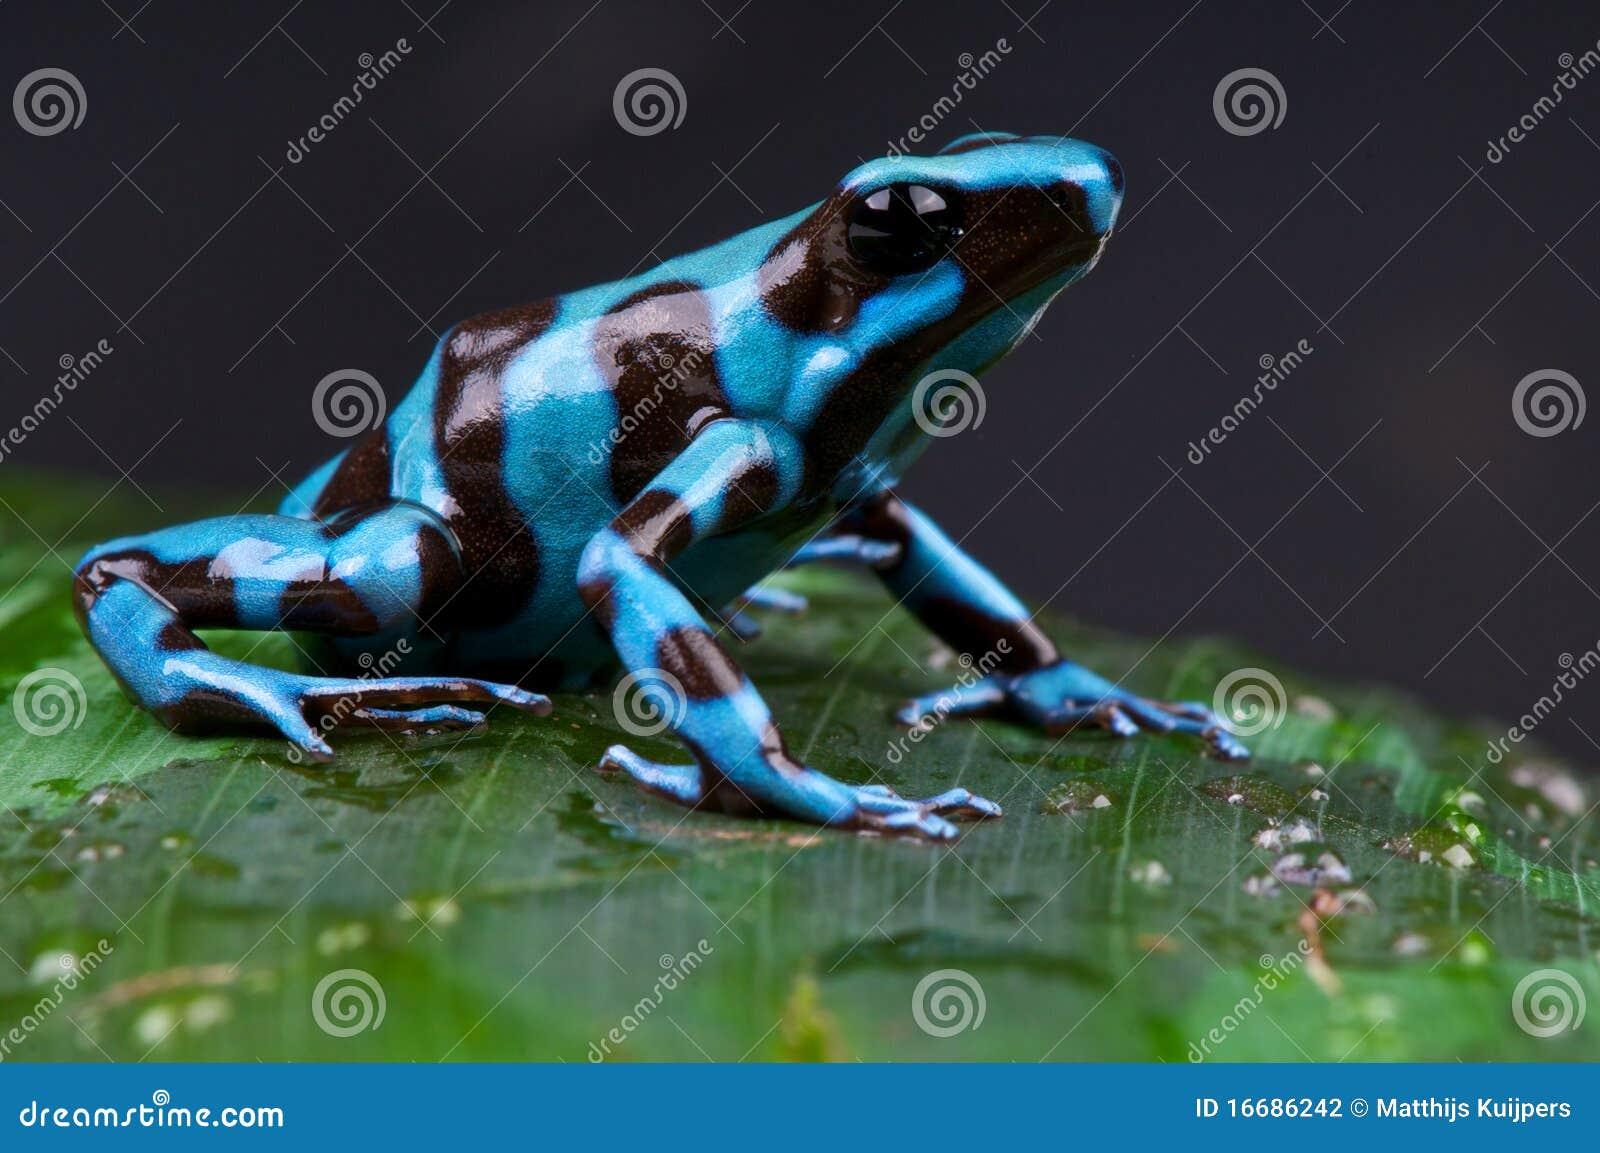 Blue and black poison dart frog